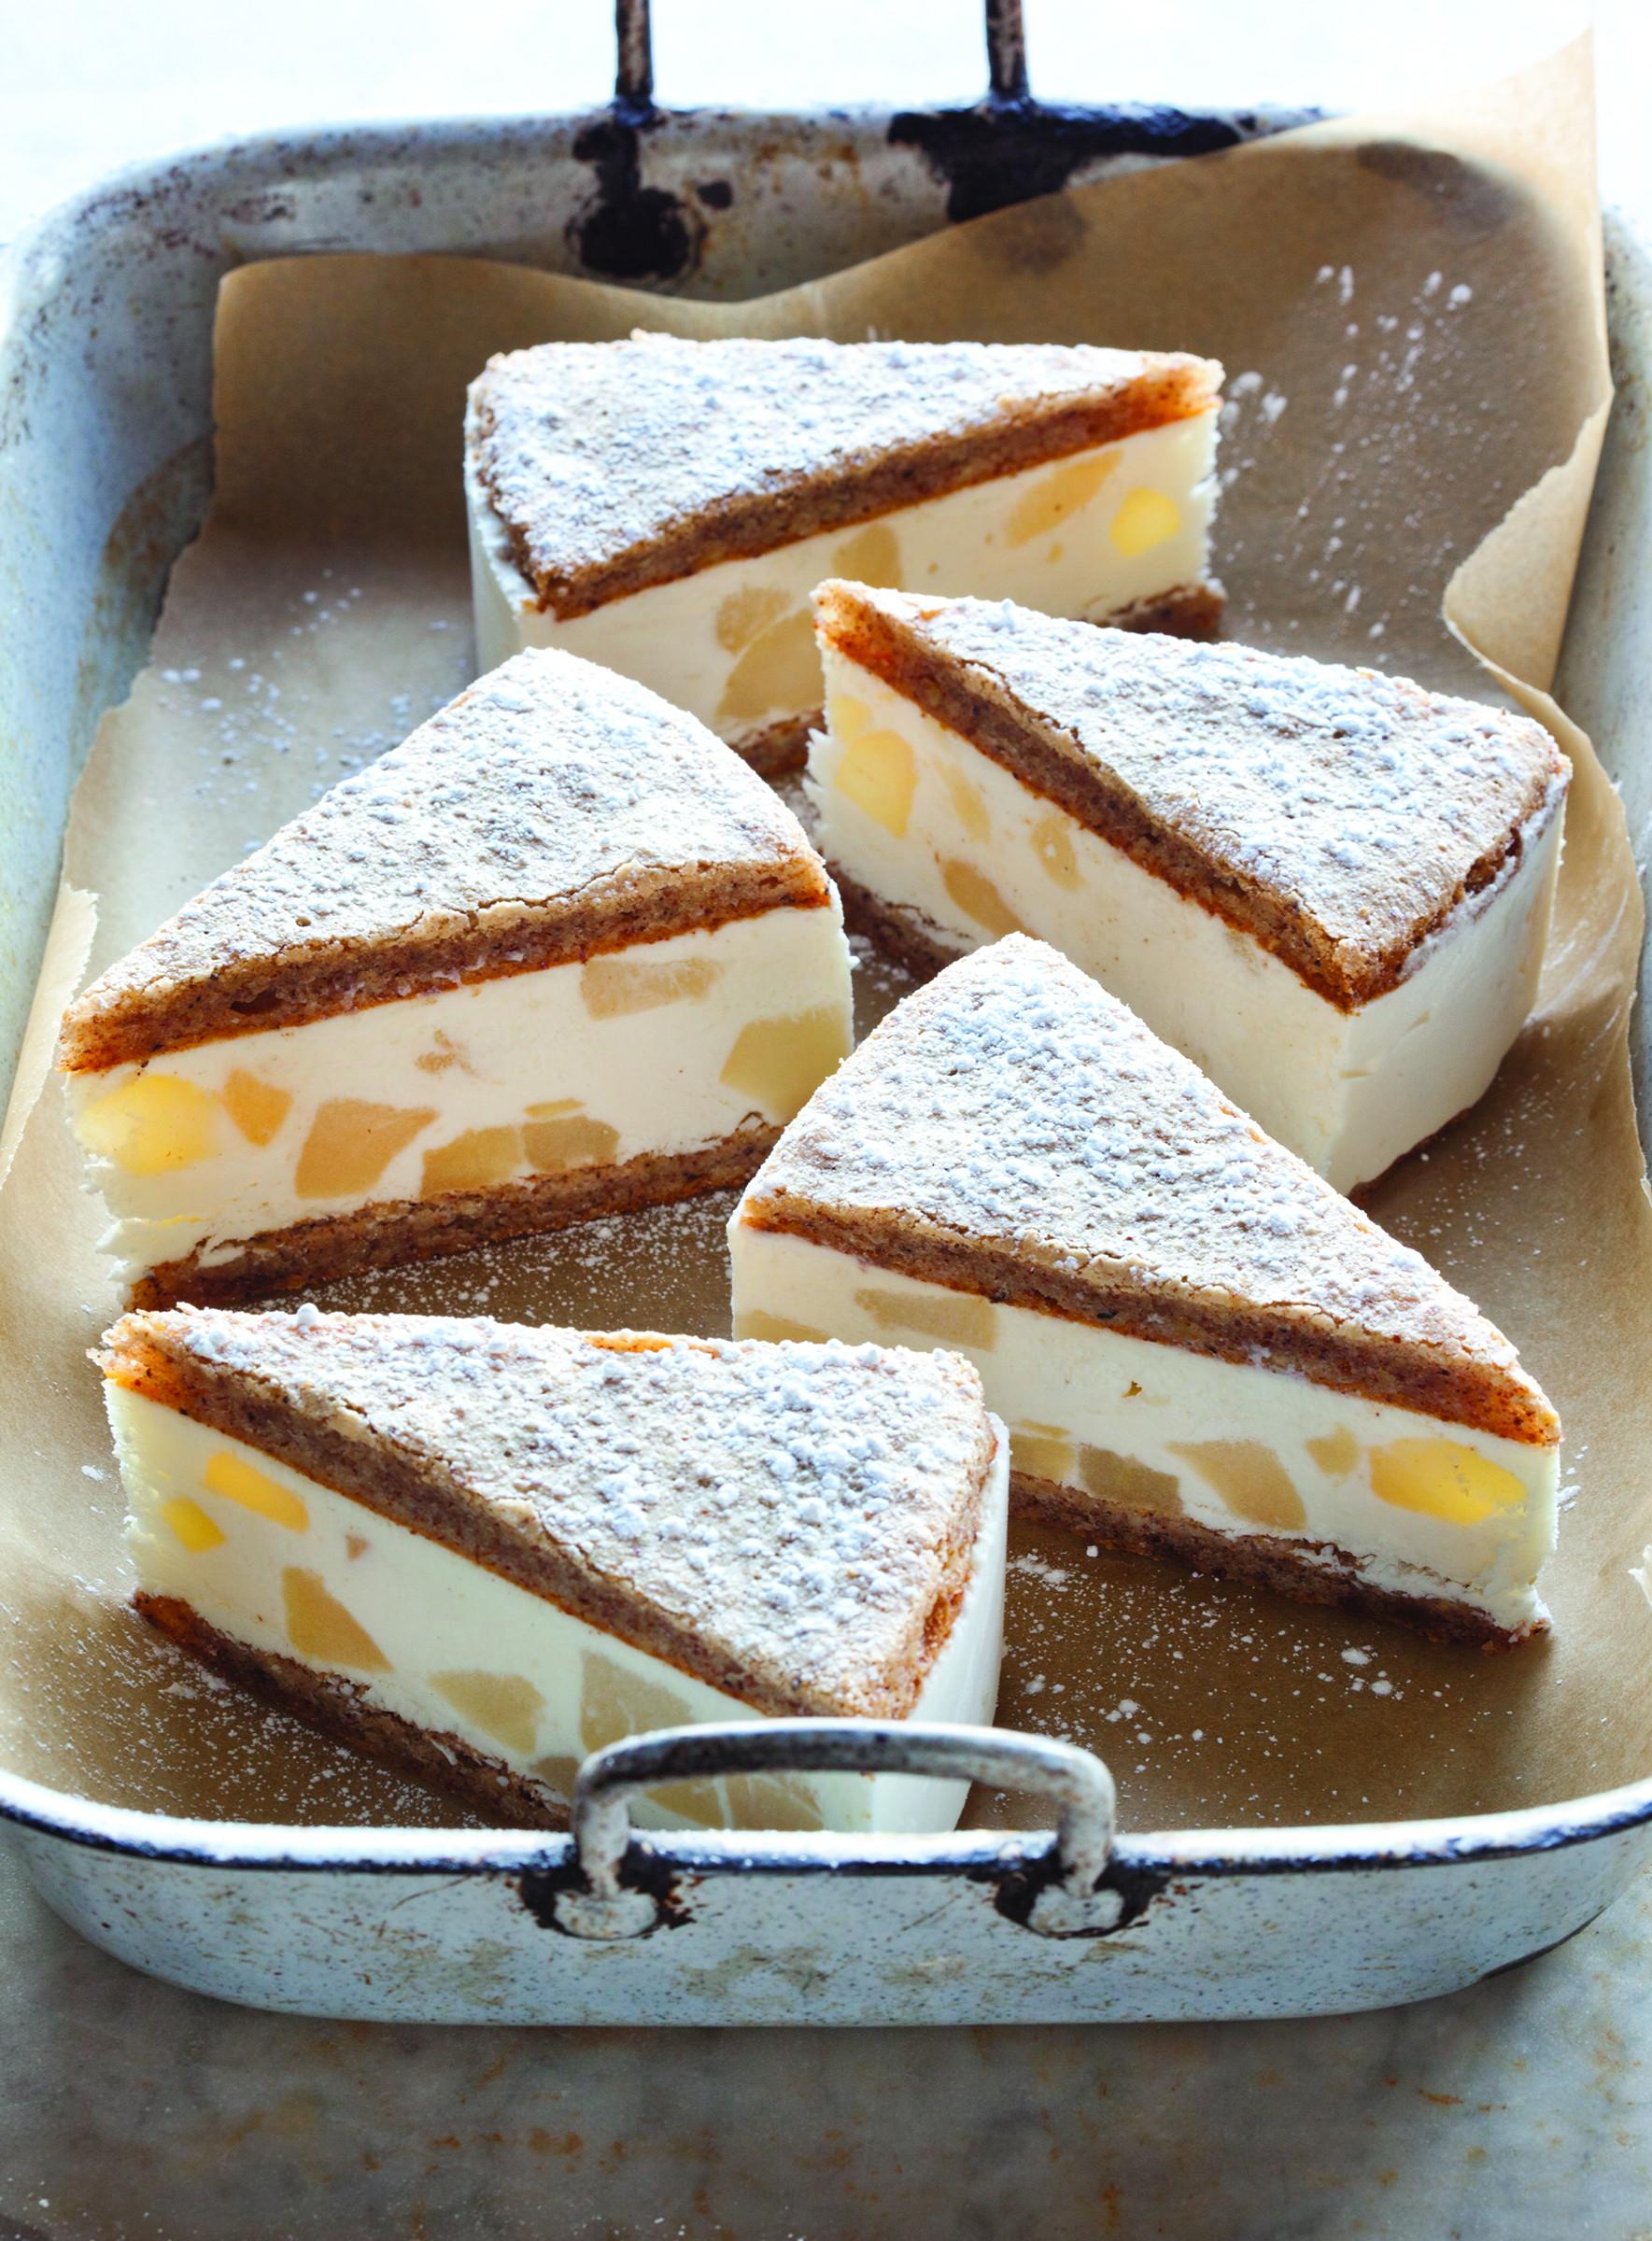 Italian Desserts Recipes  Dicembre Dolce Q & A with Rosetta Costantino and a